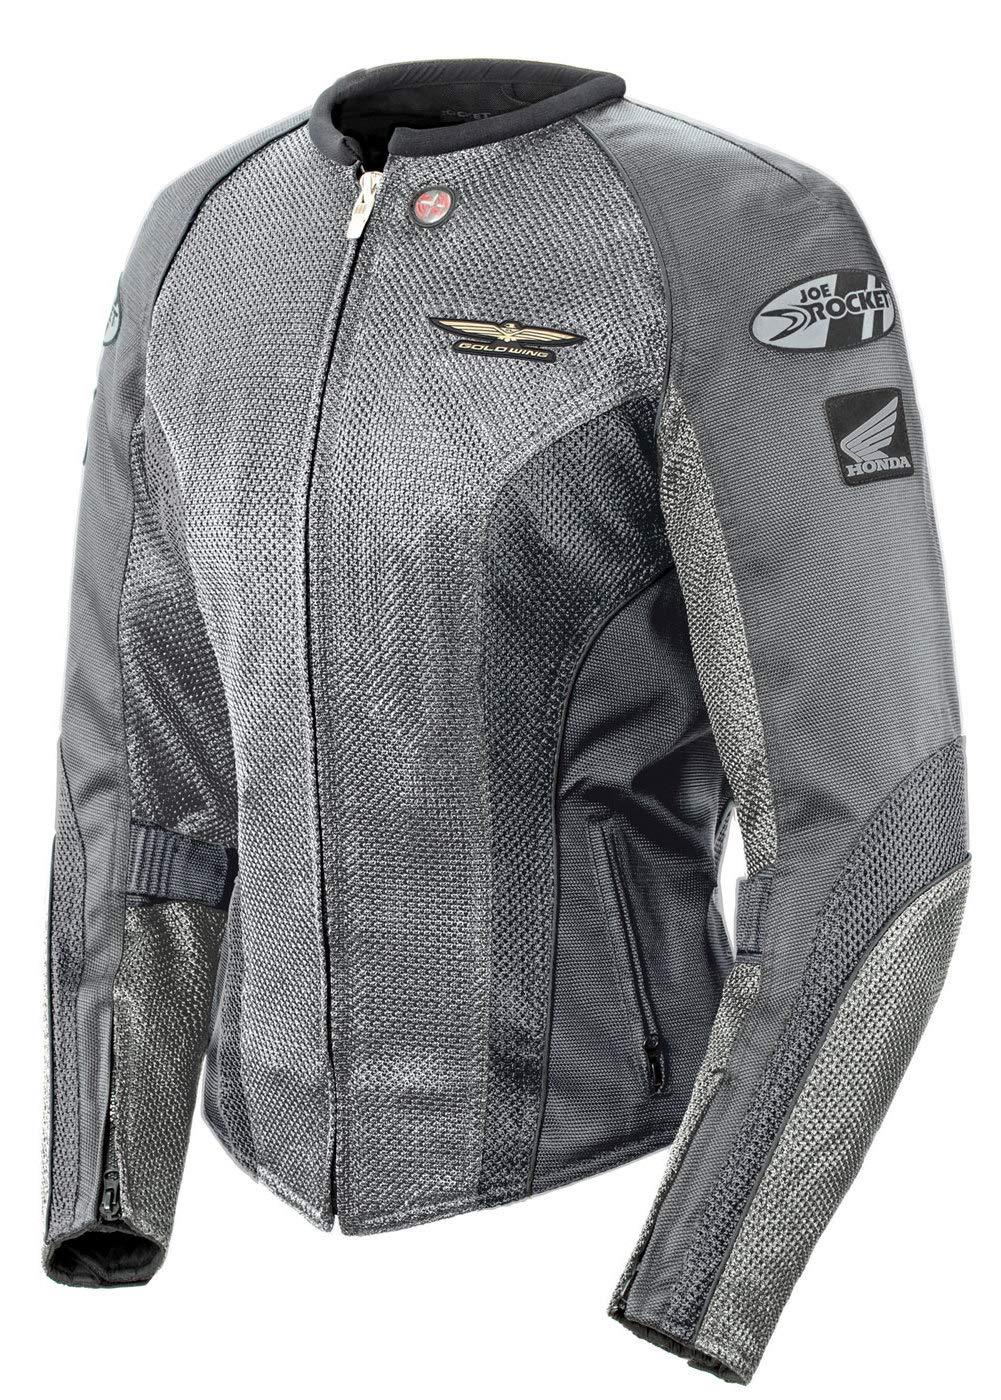 Joe Rocket Skyline 2.0 Womens Black Mesh Motorcycle Jacket - 2X-Large